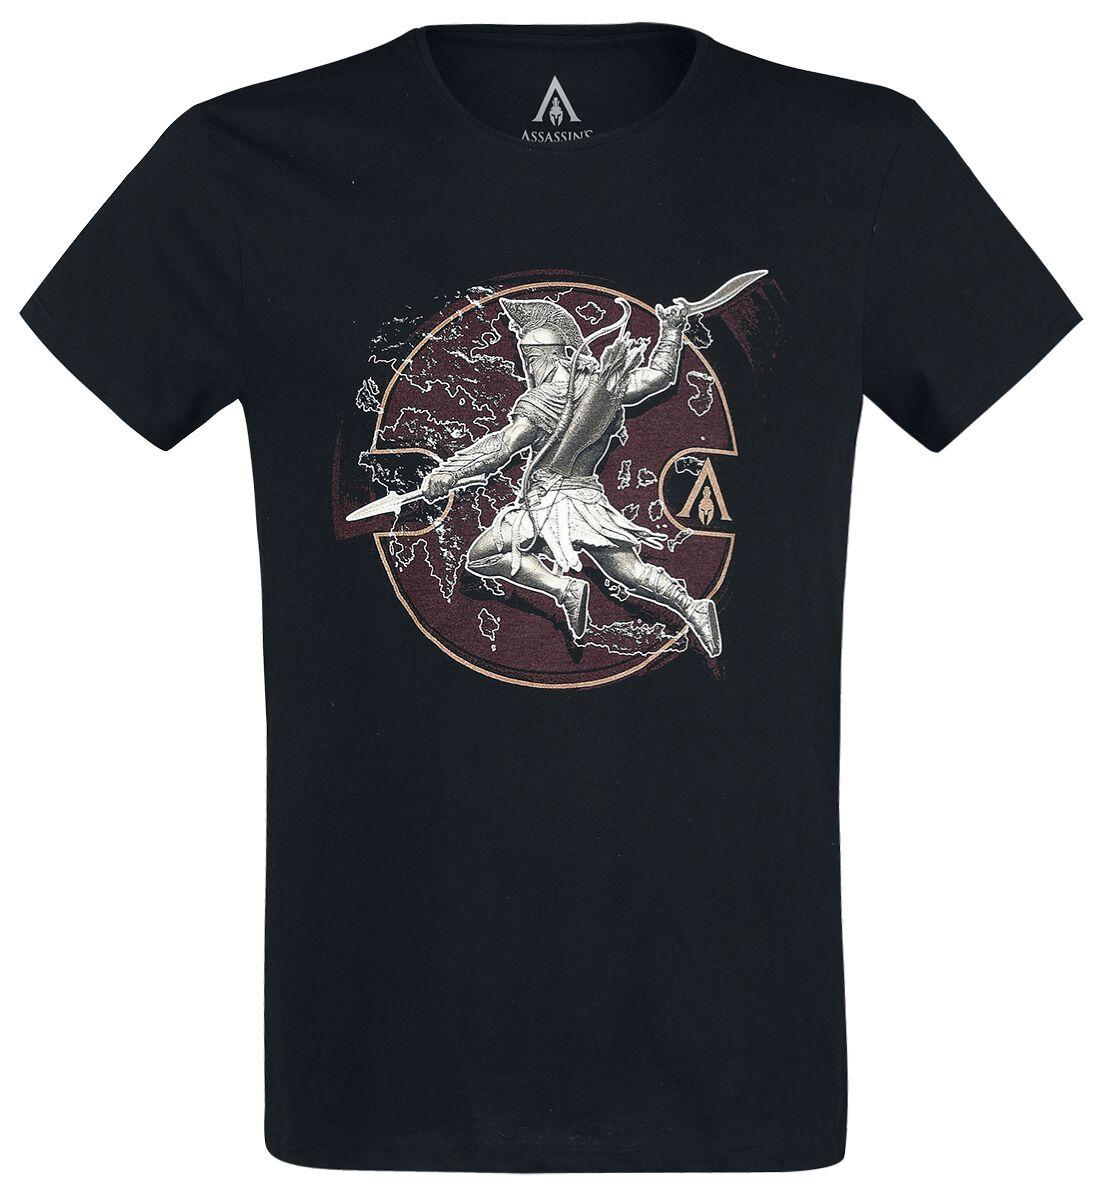 Image of   Assassin's Creed Odyssey - Alexios Desitiny T-Shirt sort